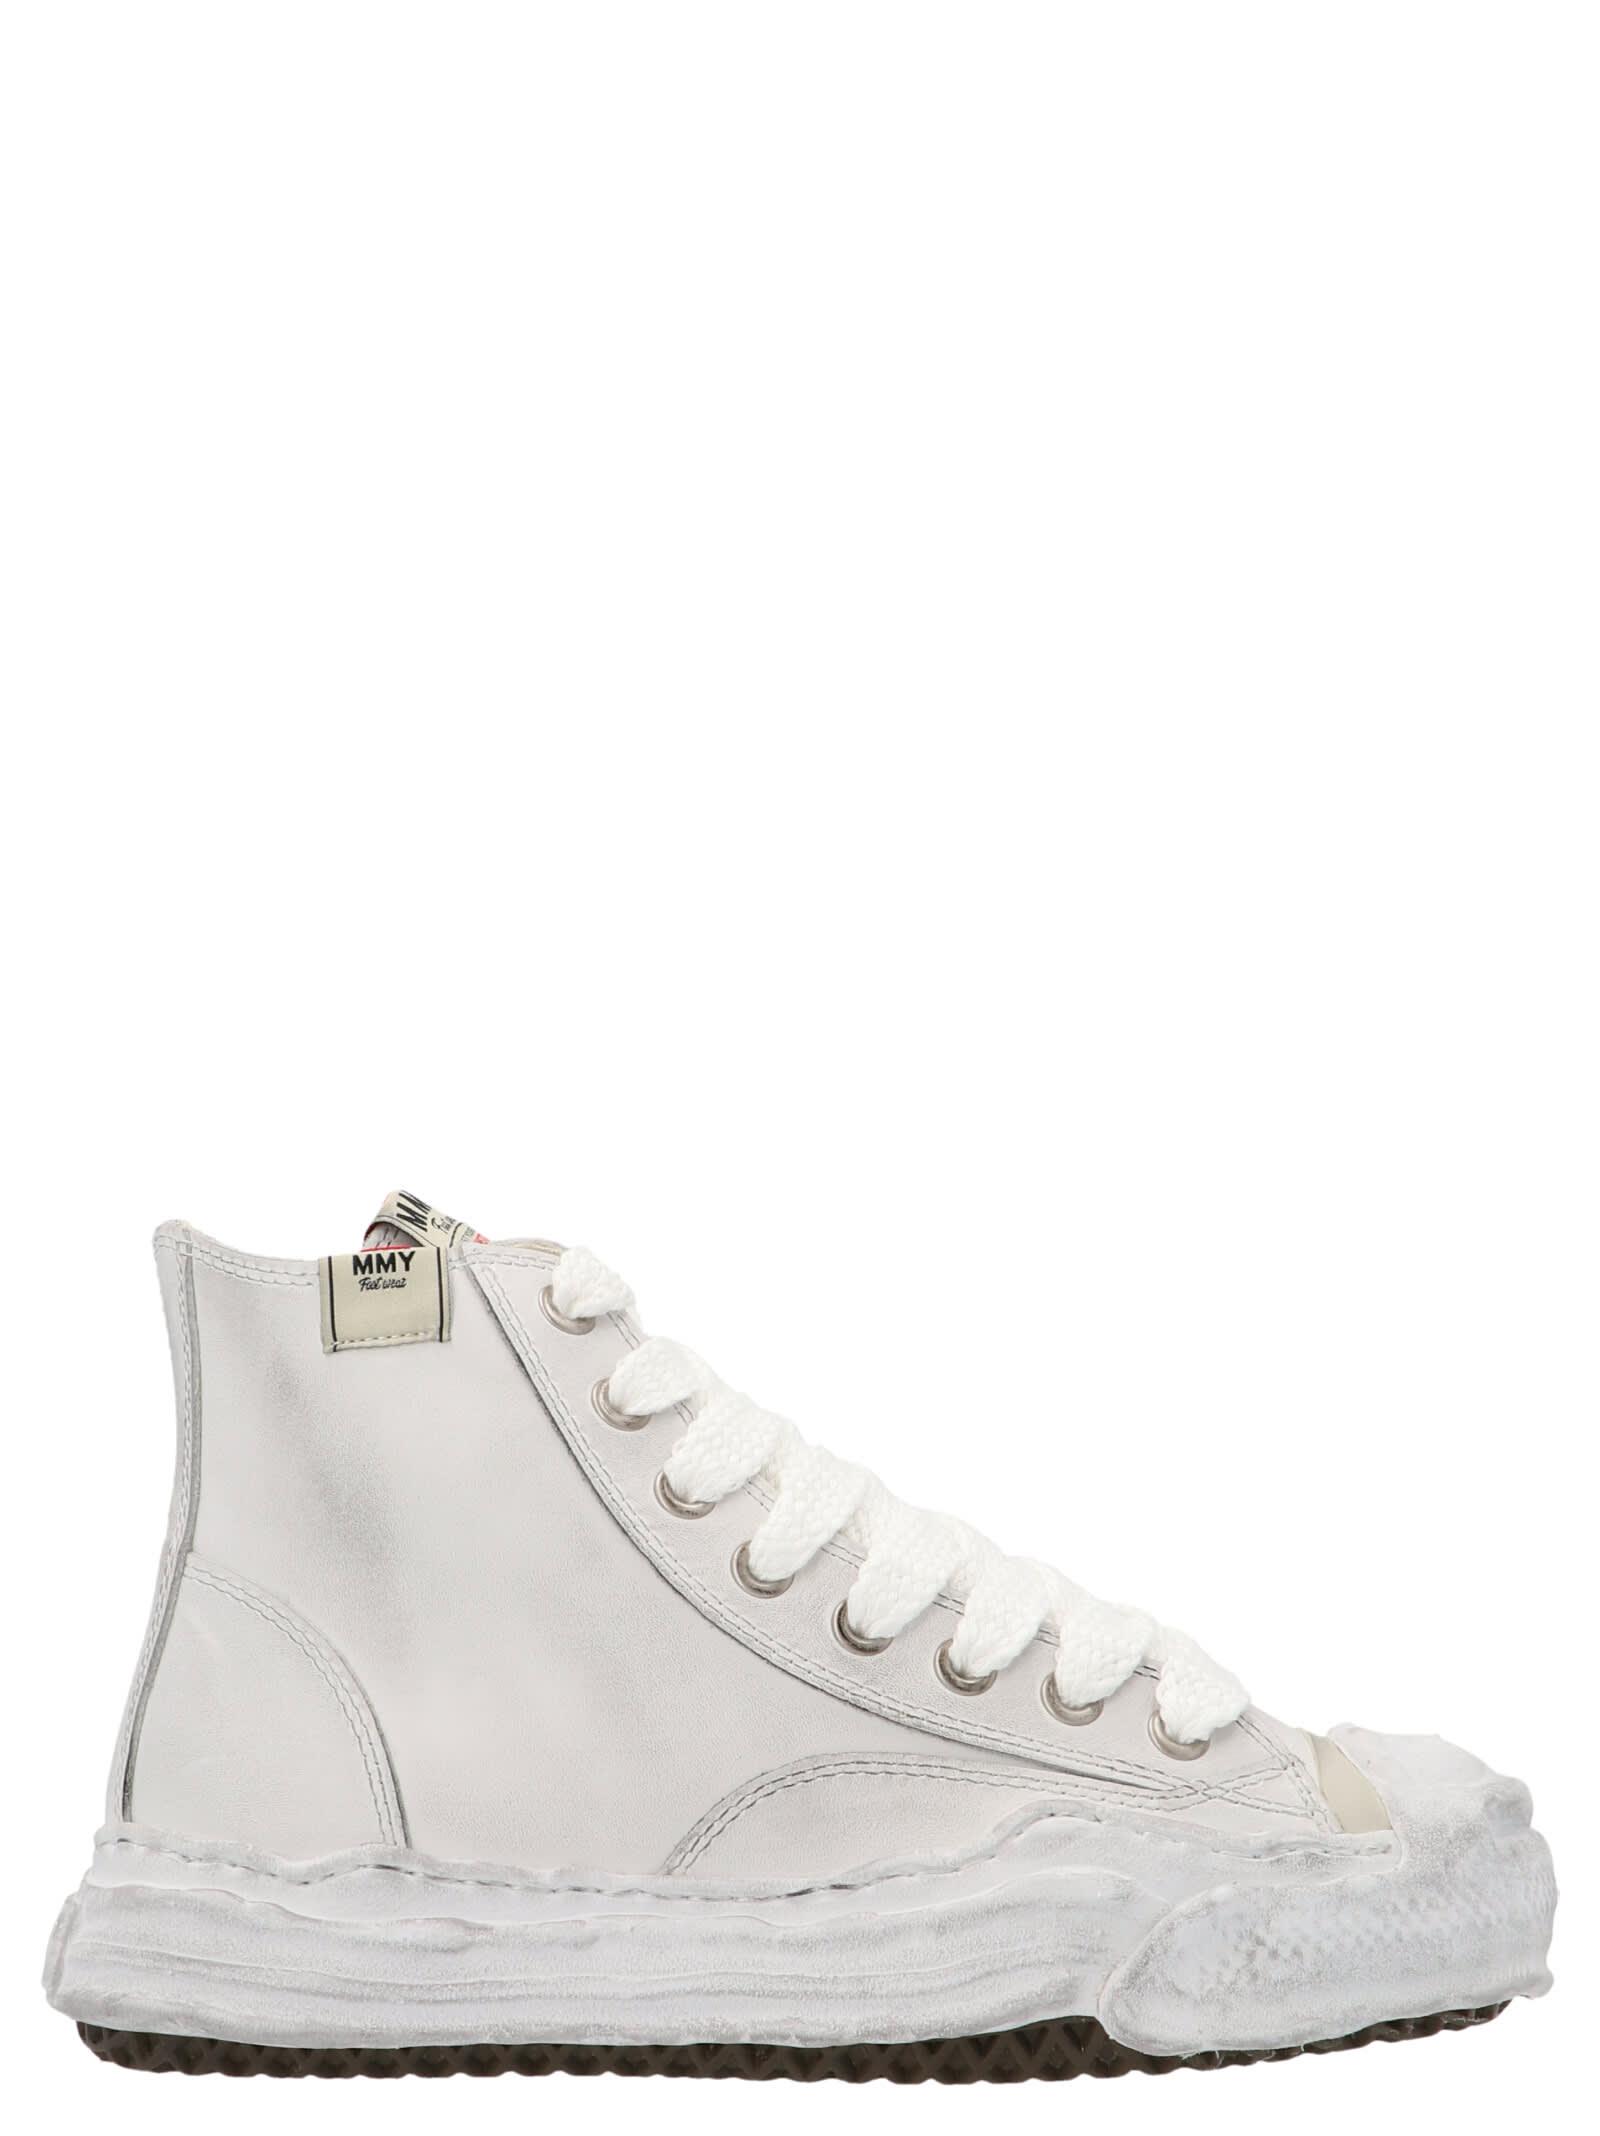 hank High Shoes